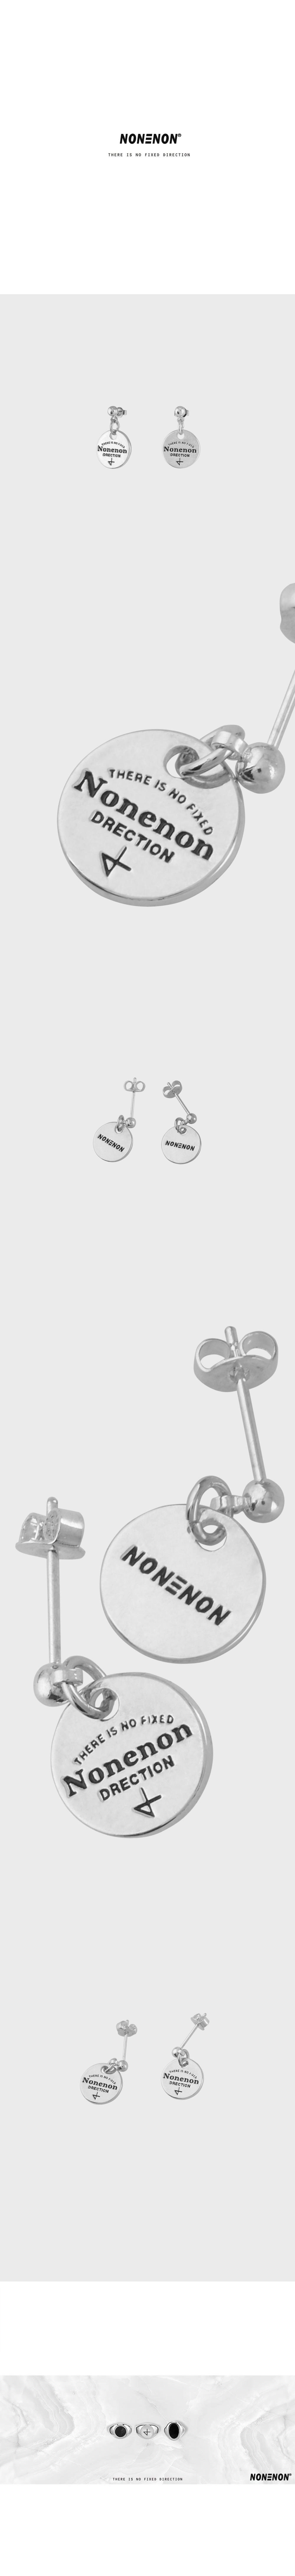 31 NEW LOGO EAR (4).jpg